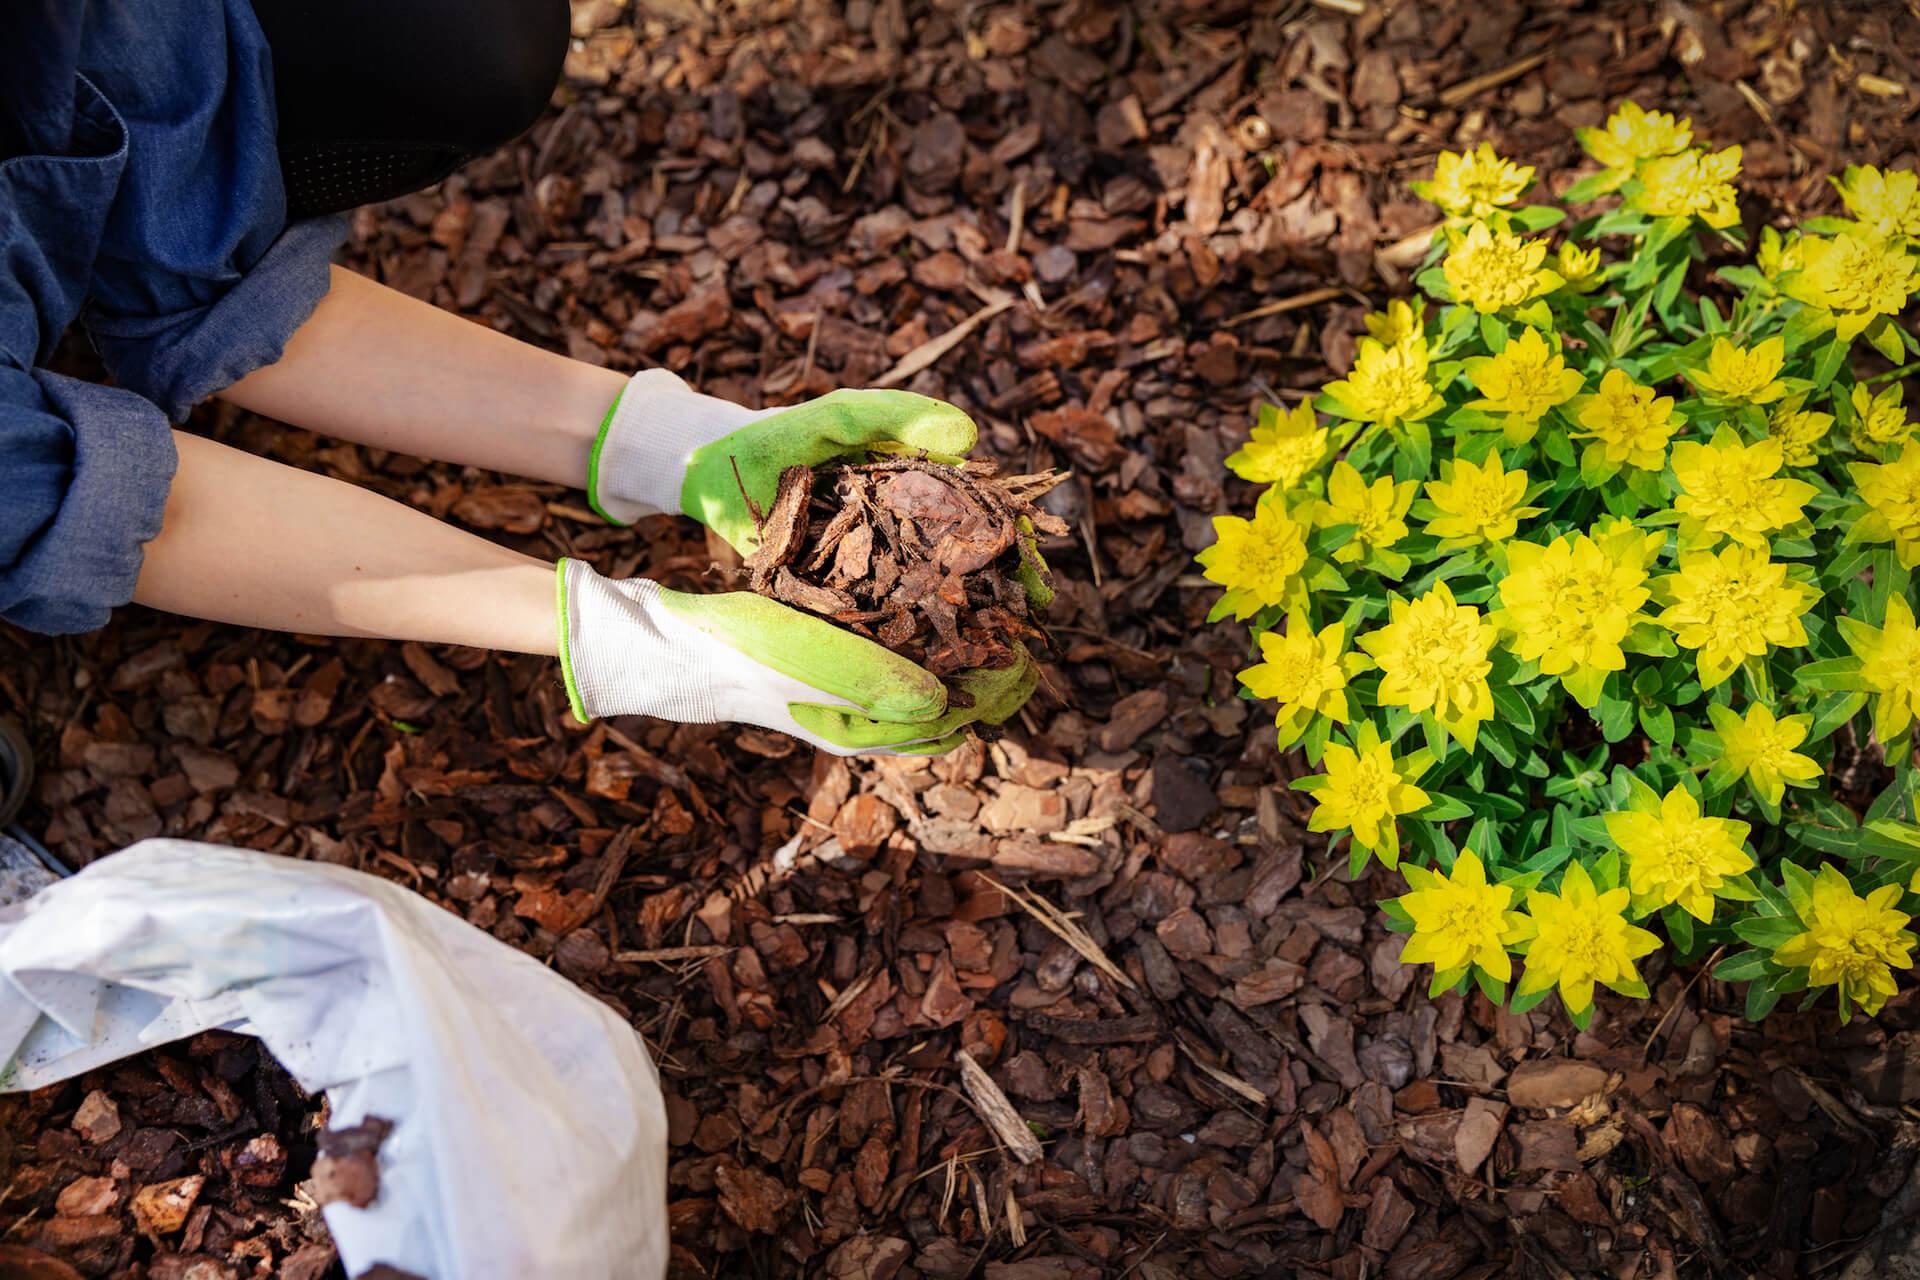 Woman holding a handful of mulch next tis yellow flower bush